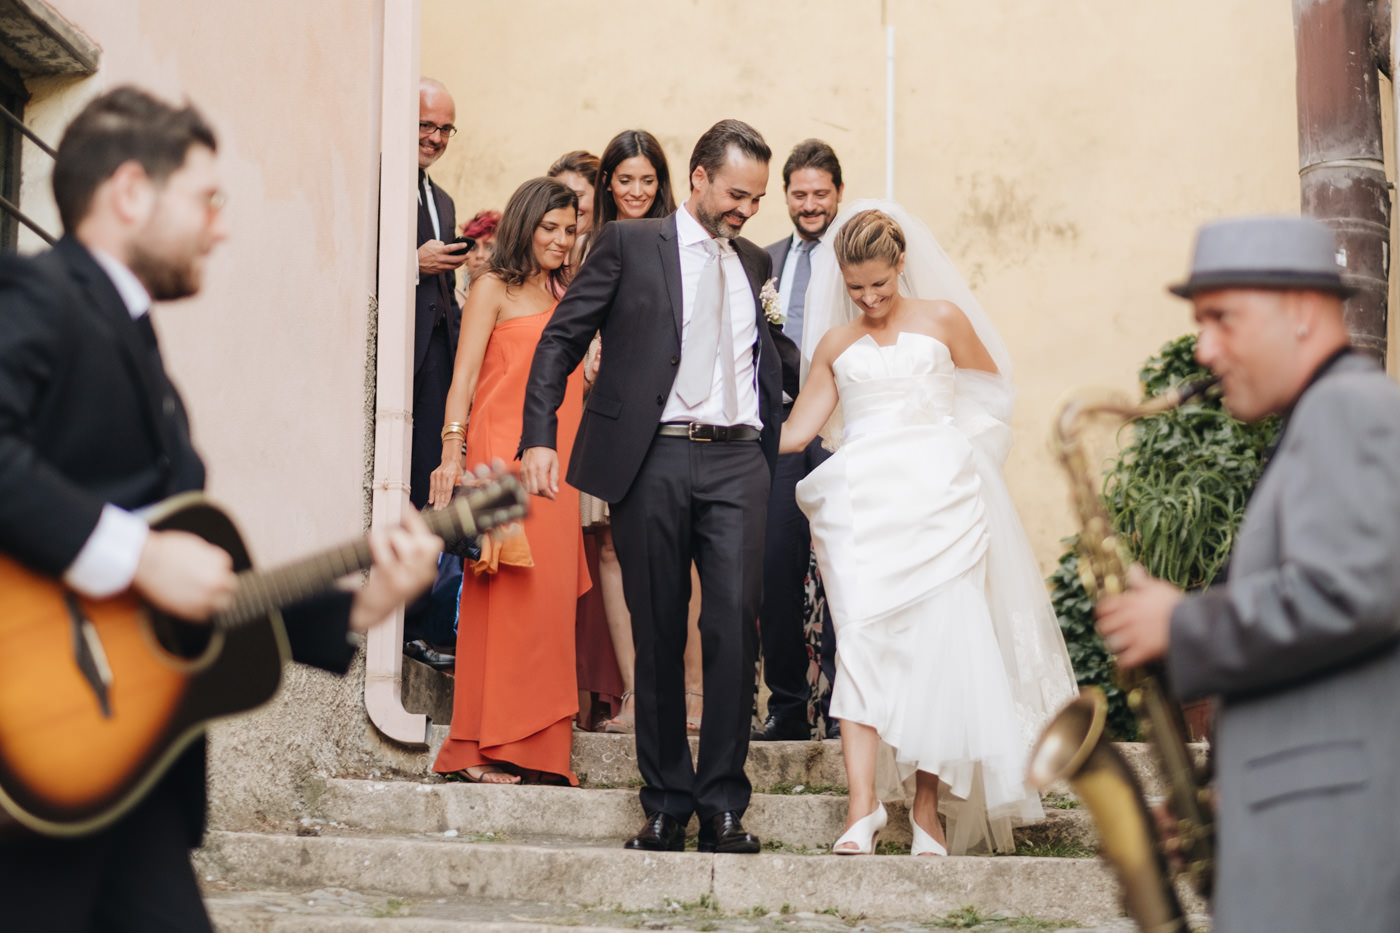 matrimoni_all_italiana_fotografo_matrimonio_cinque_terre-57.jpg